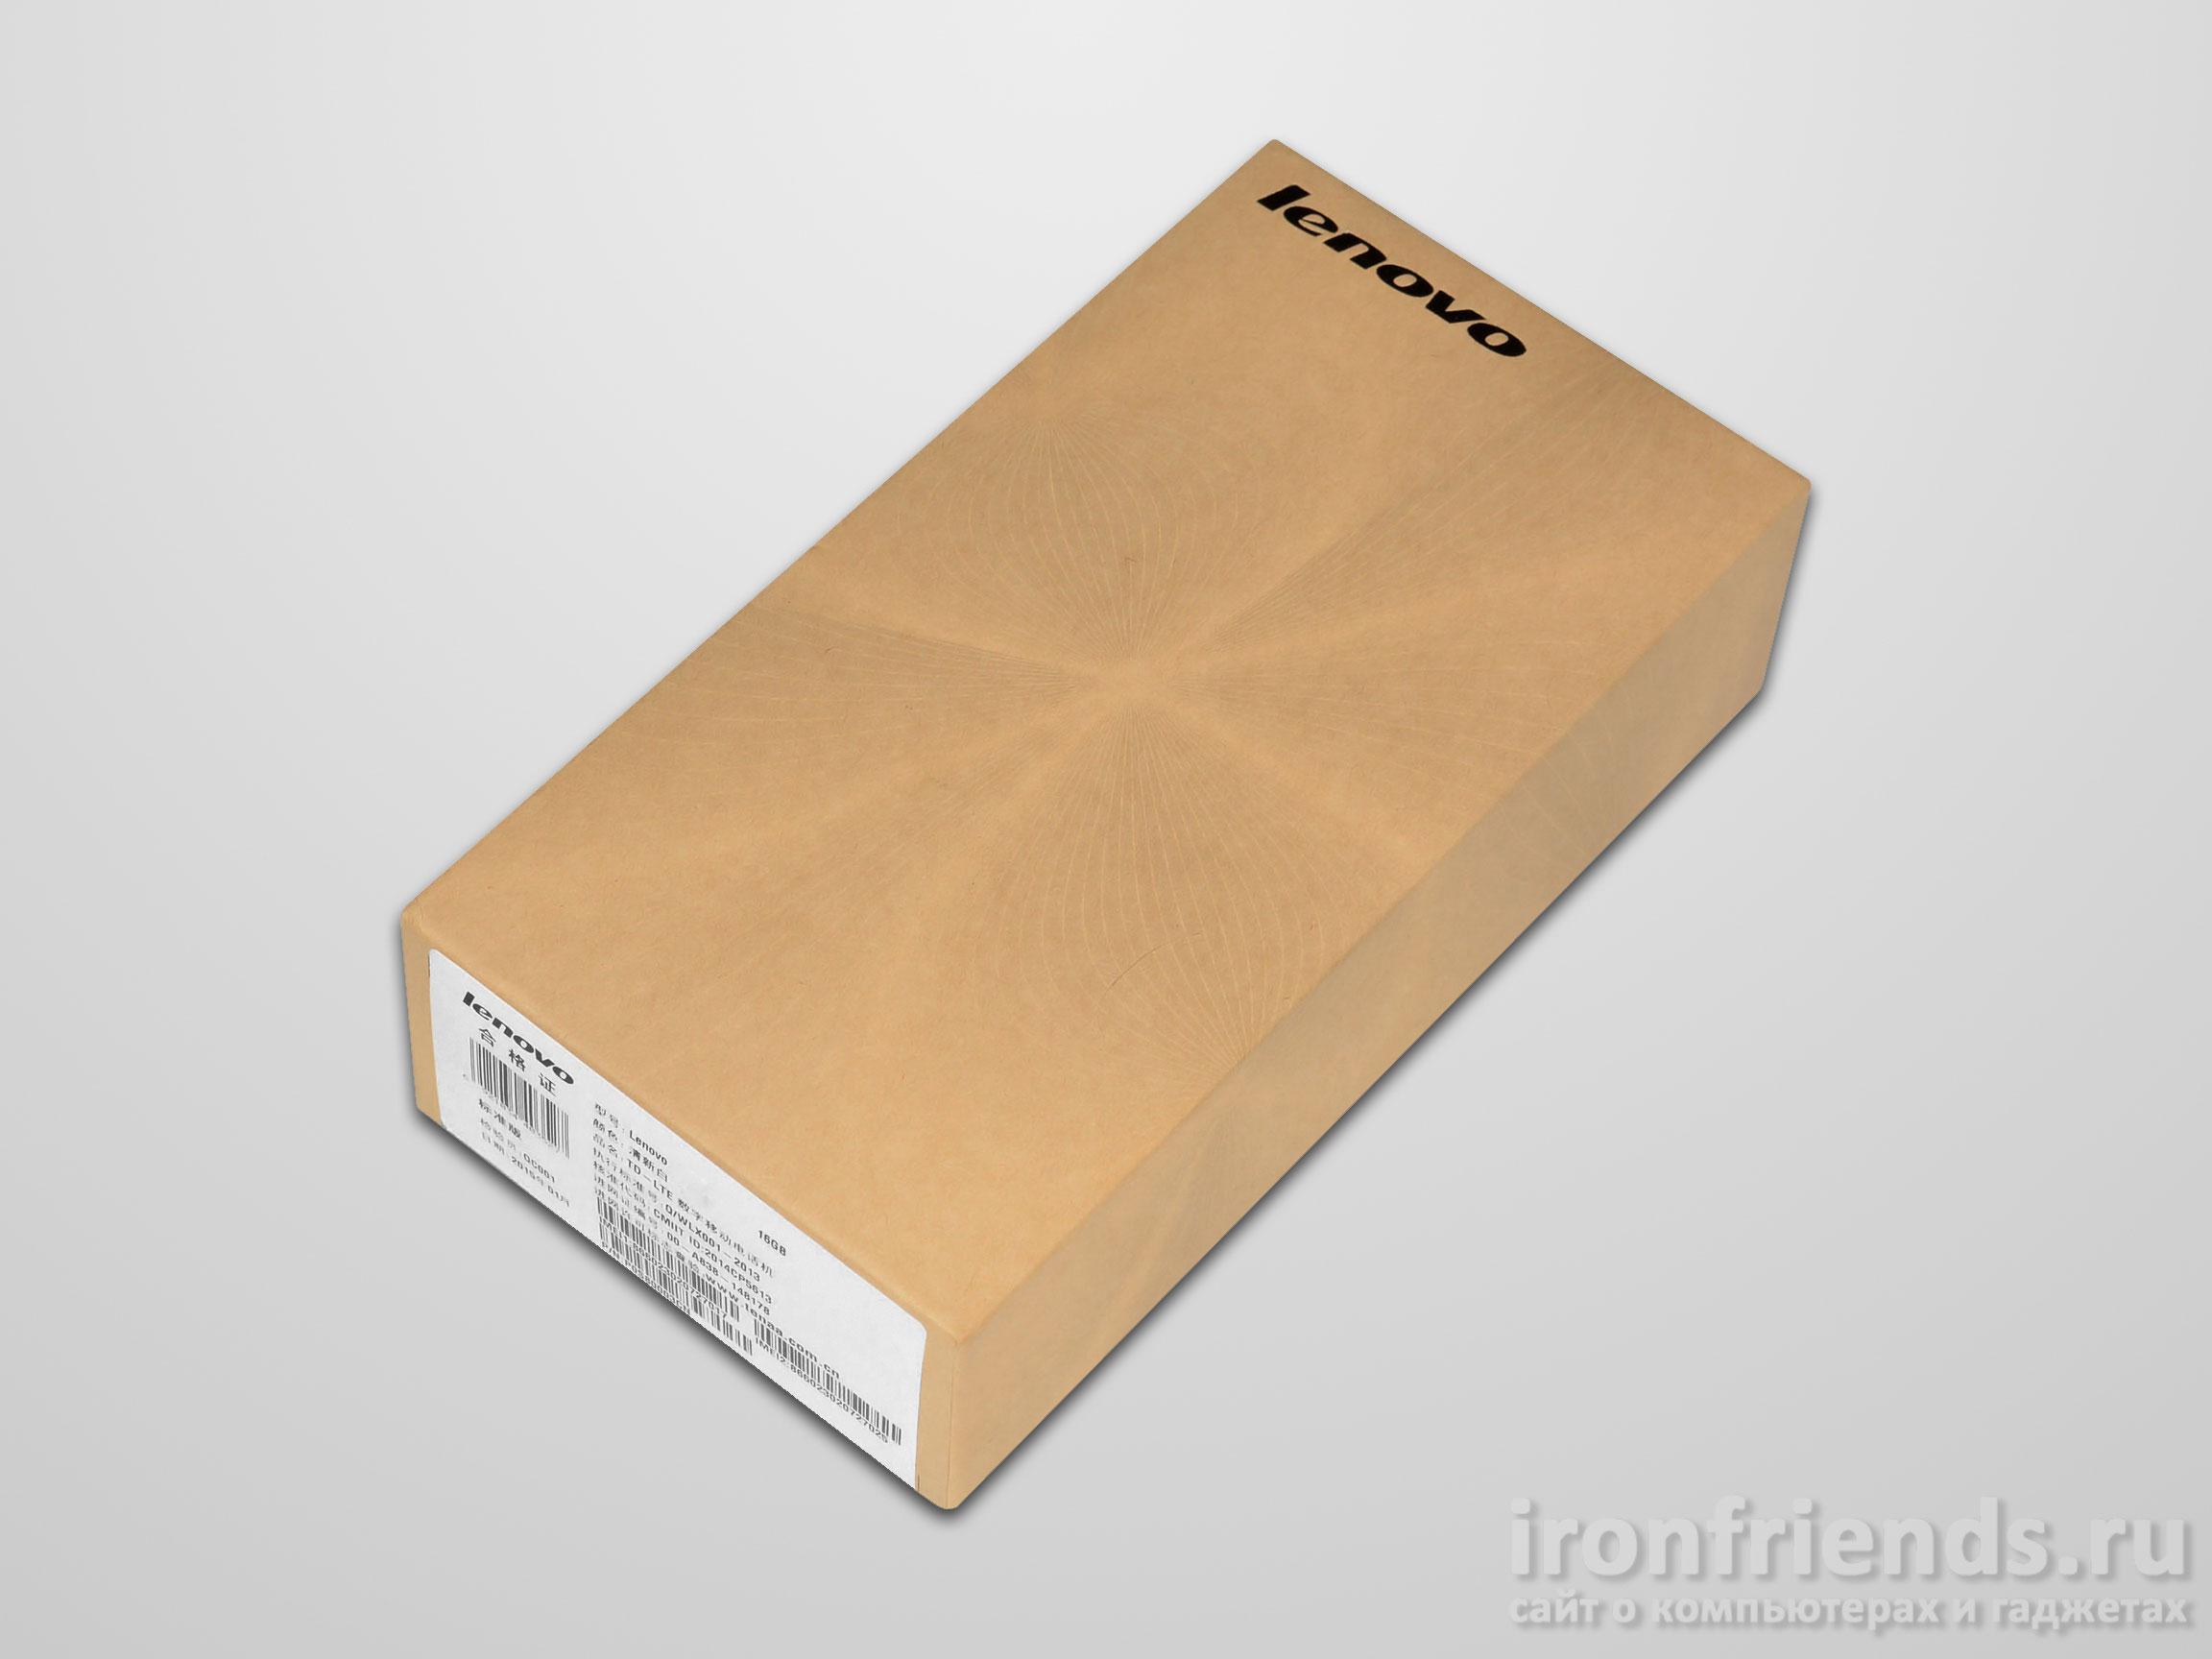 Упаковка смартфона